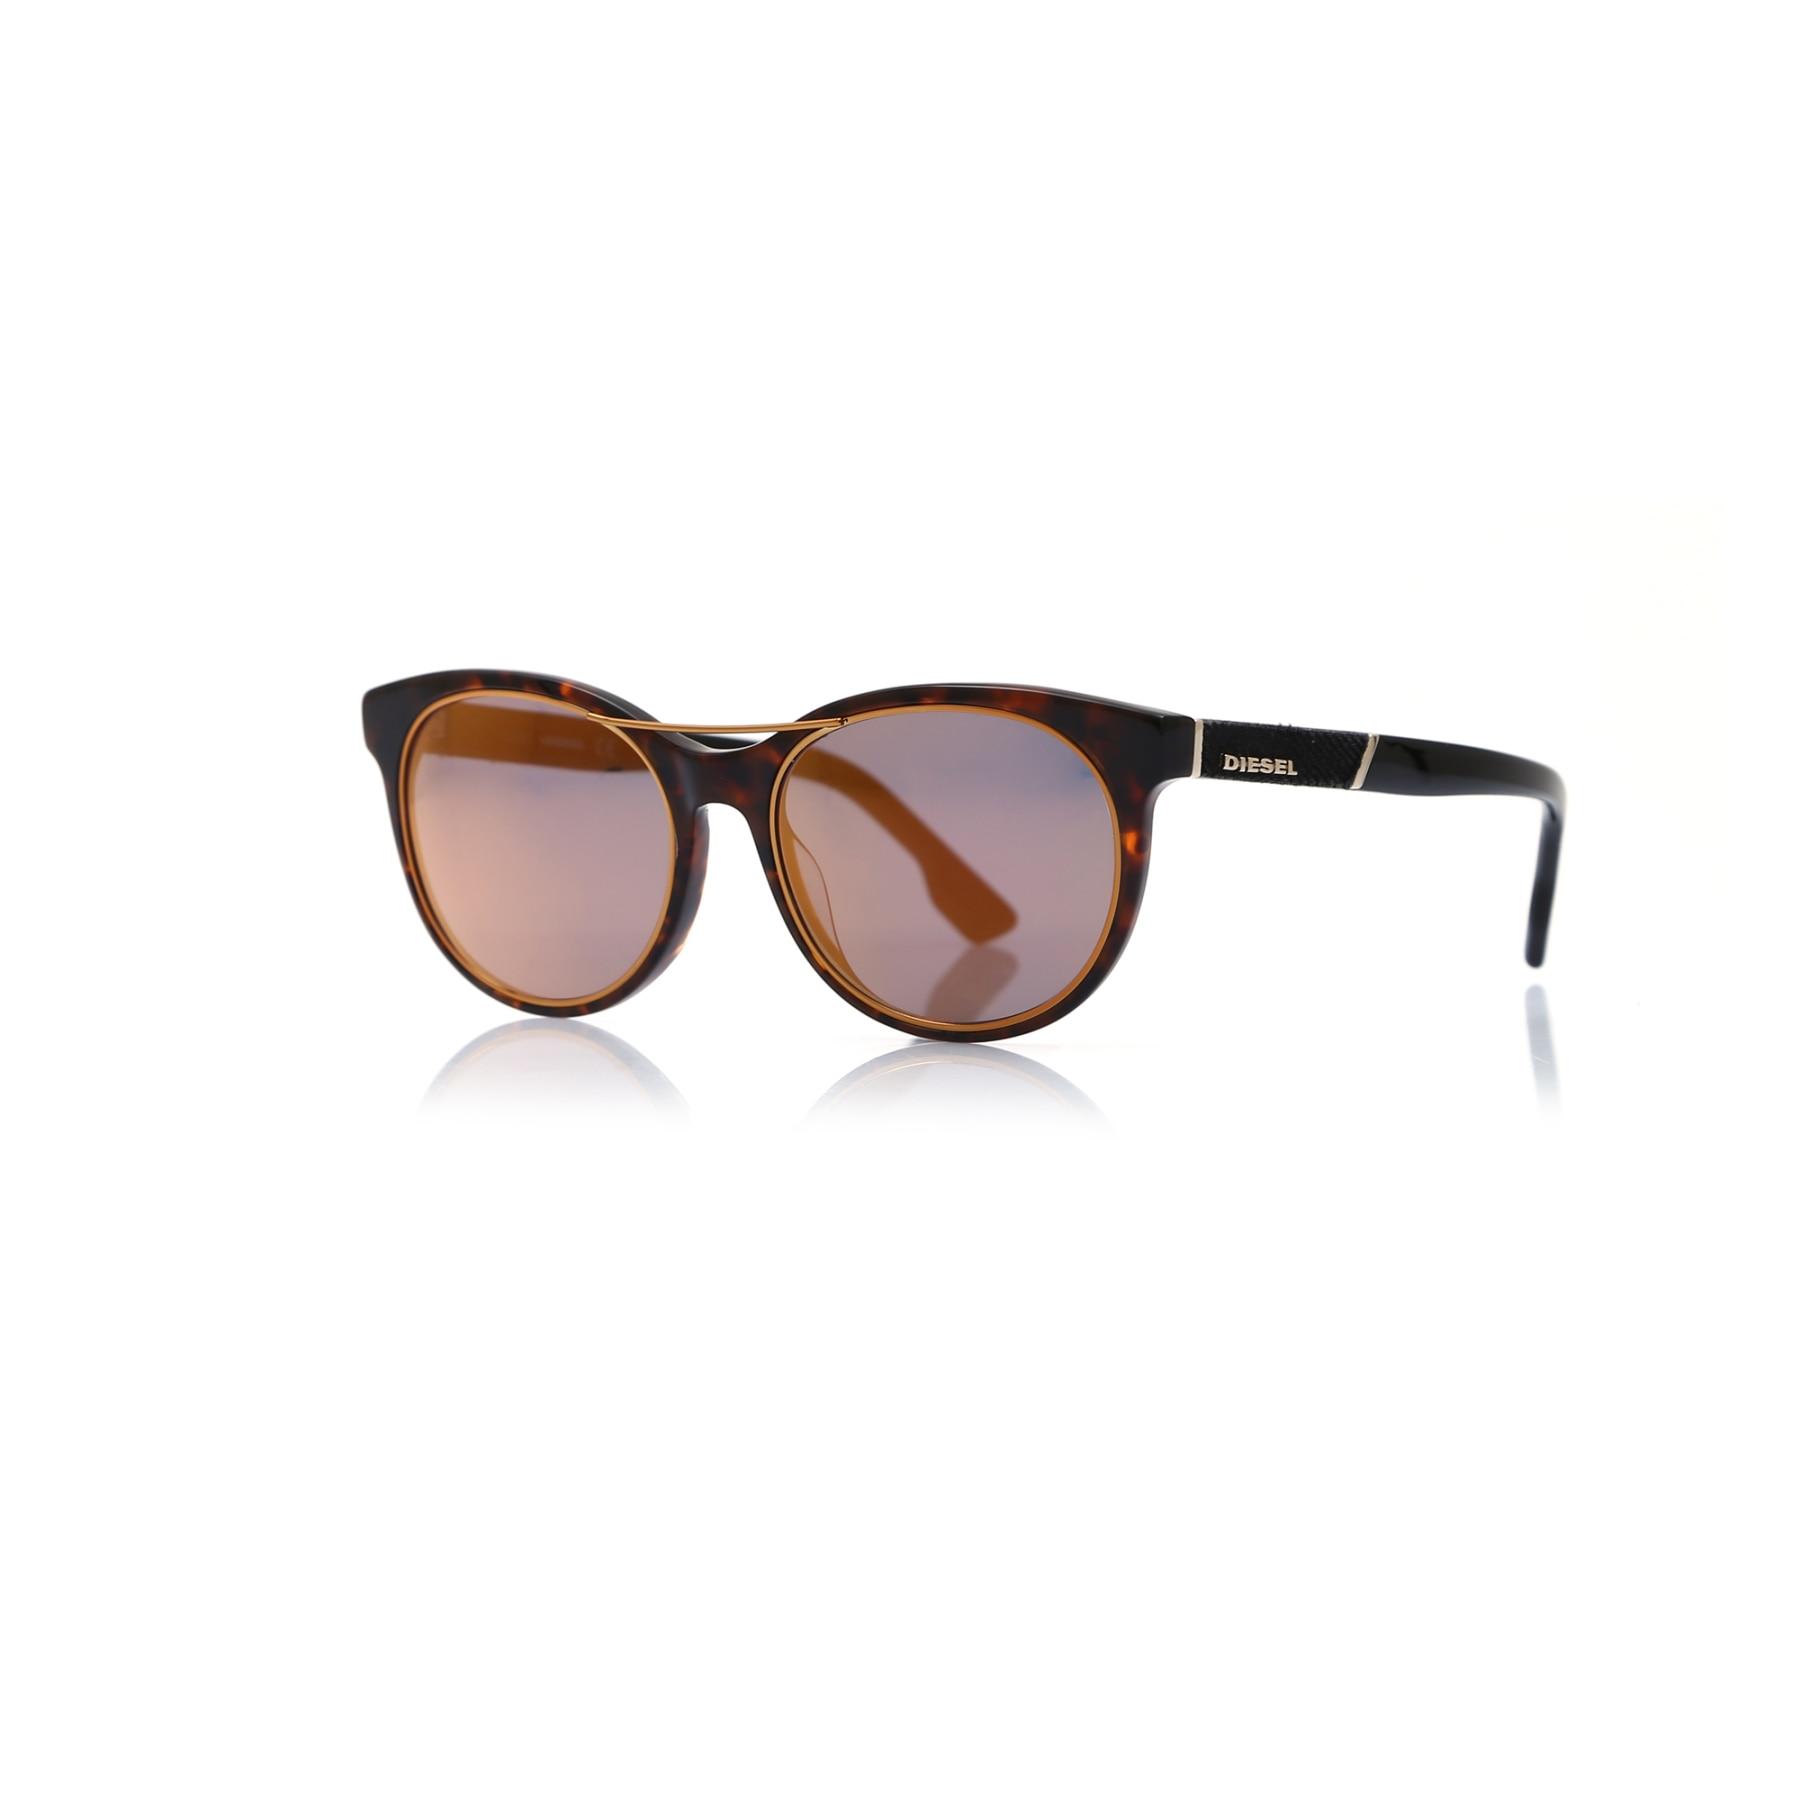 Unisex sunglasses dl 0213 52x bone Brown organic oval aval 55-19-140 diesel